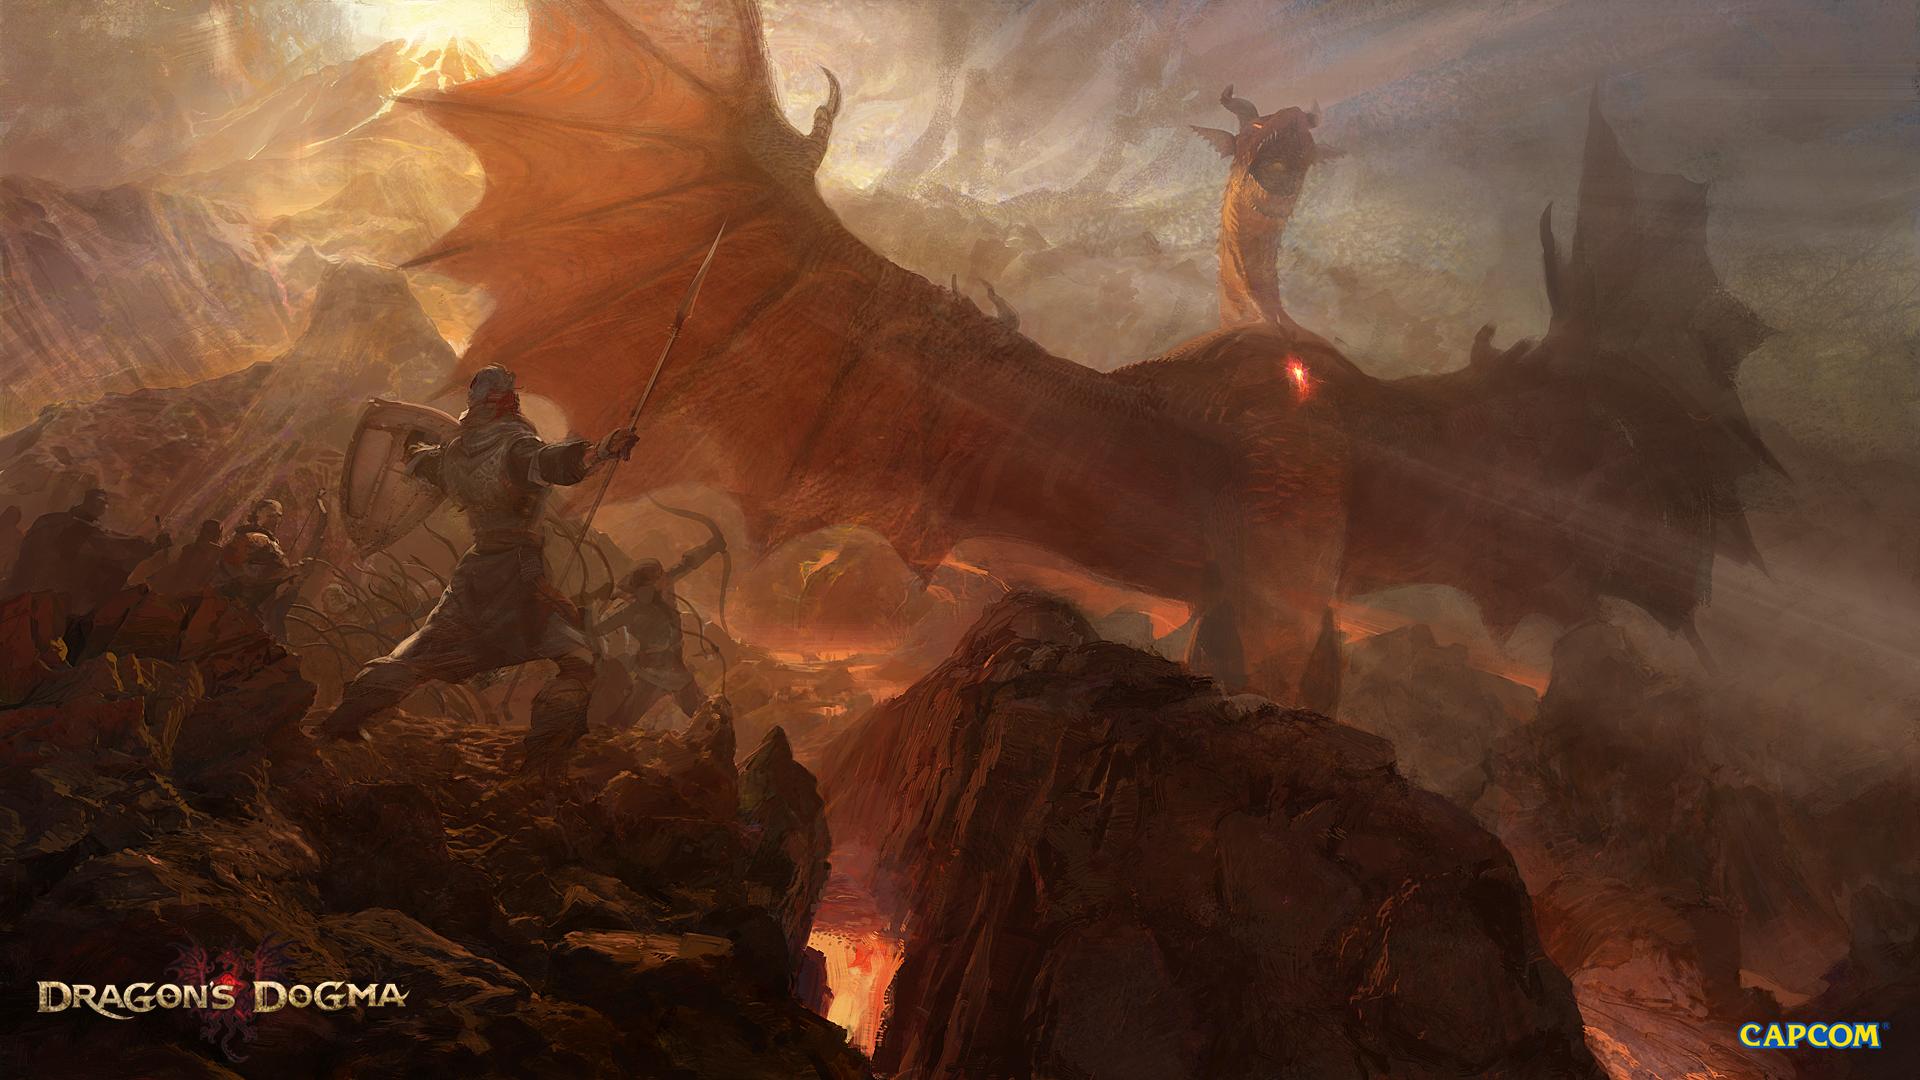 Dragons Dogma HD Wallpaper